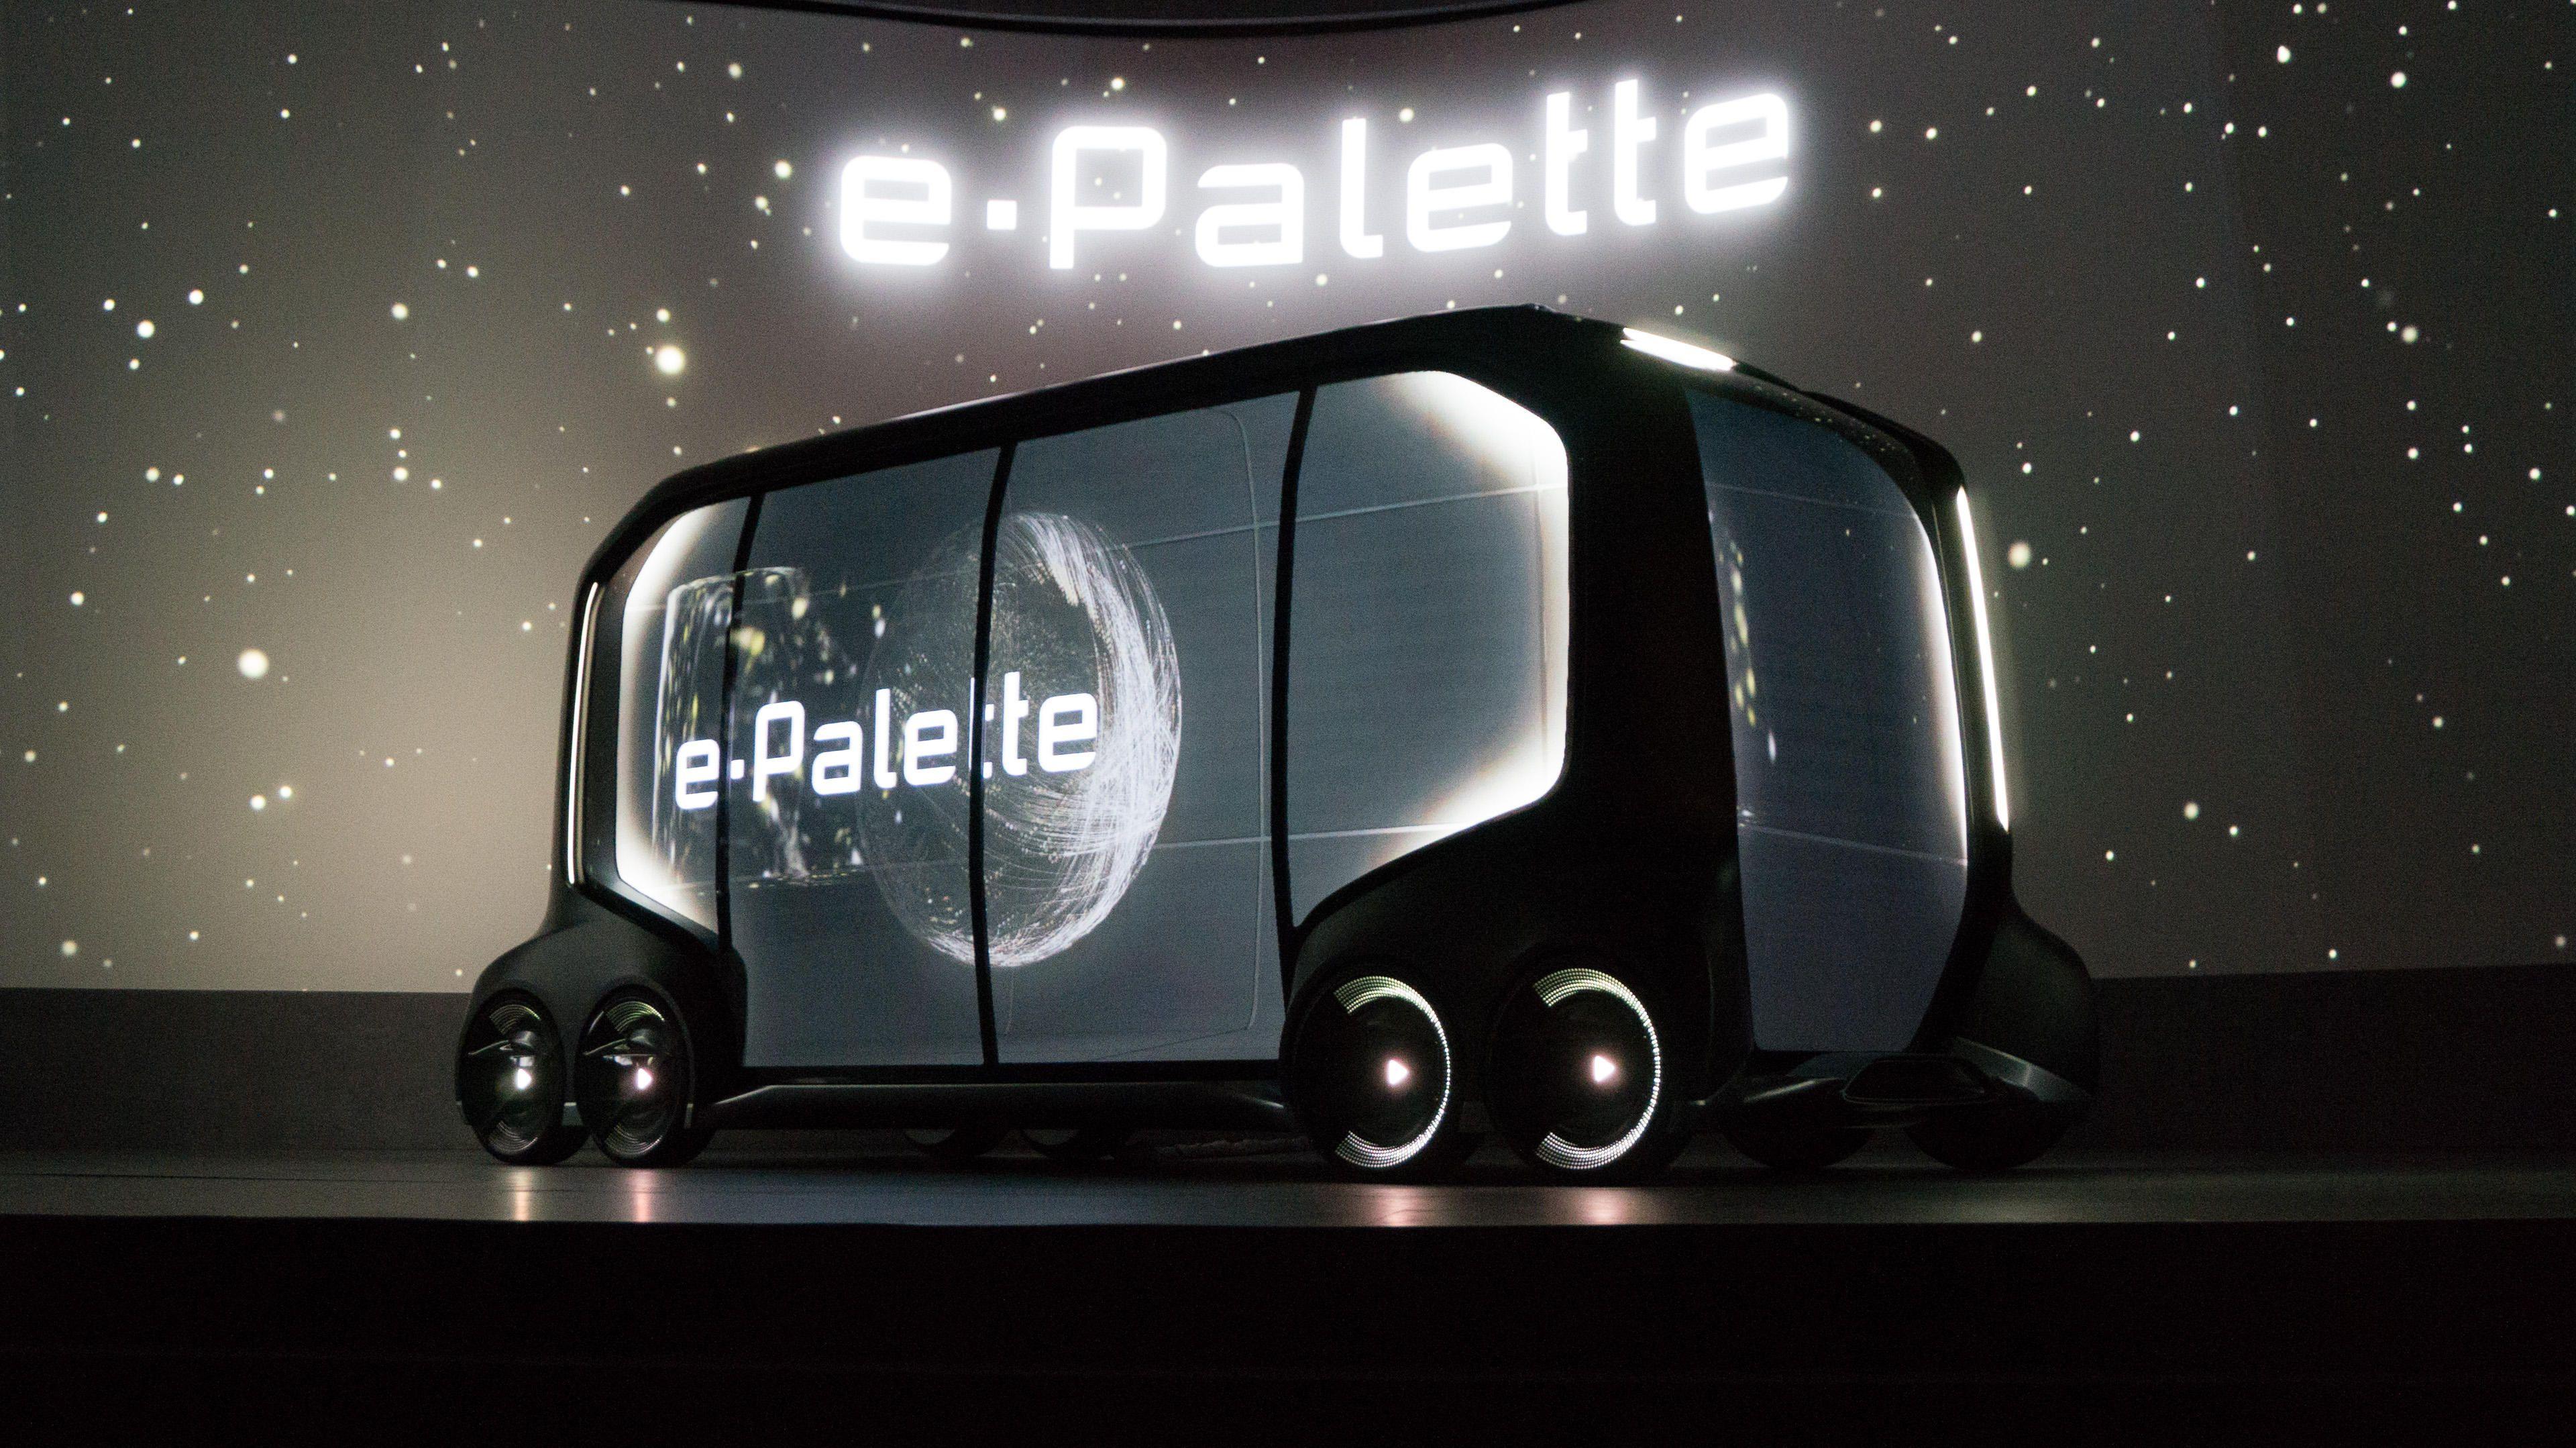 Best of CES 2018로 뽑힌 도요타의 자율주행 기반 이동식 플랫폼, e-Pallette